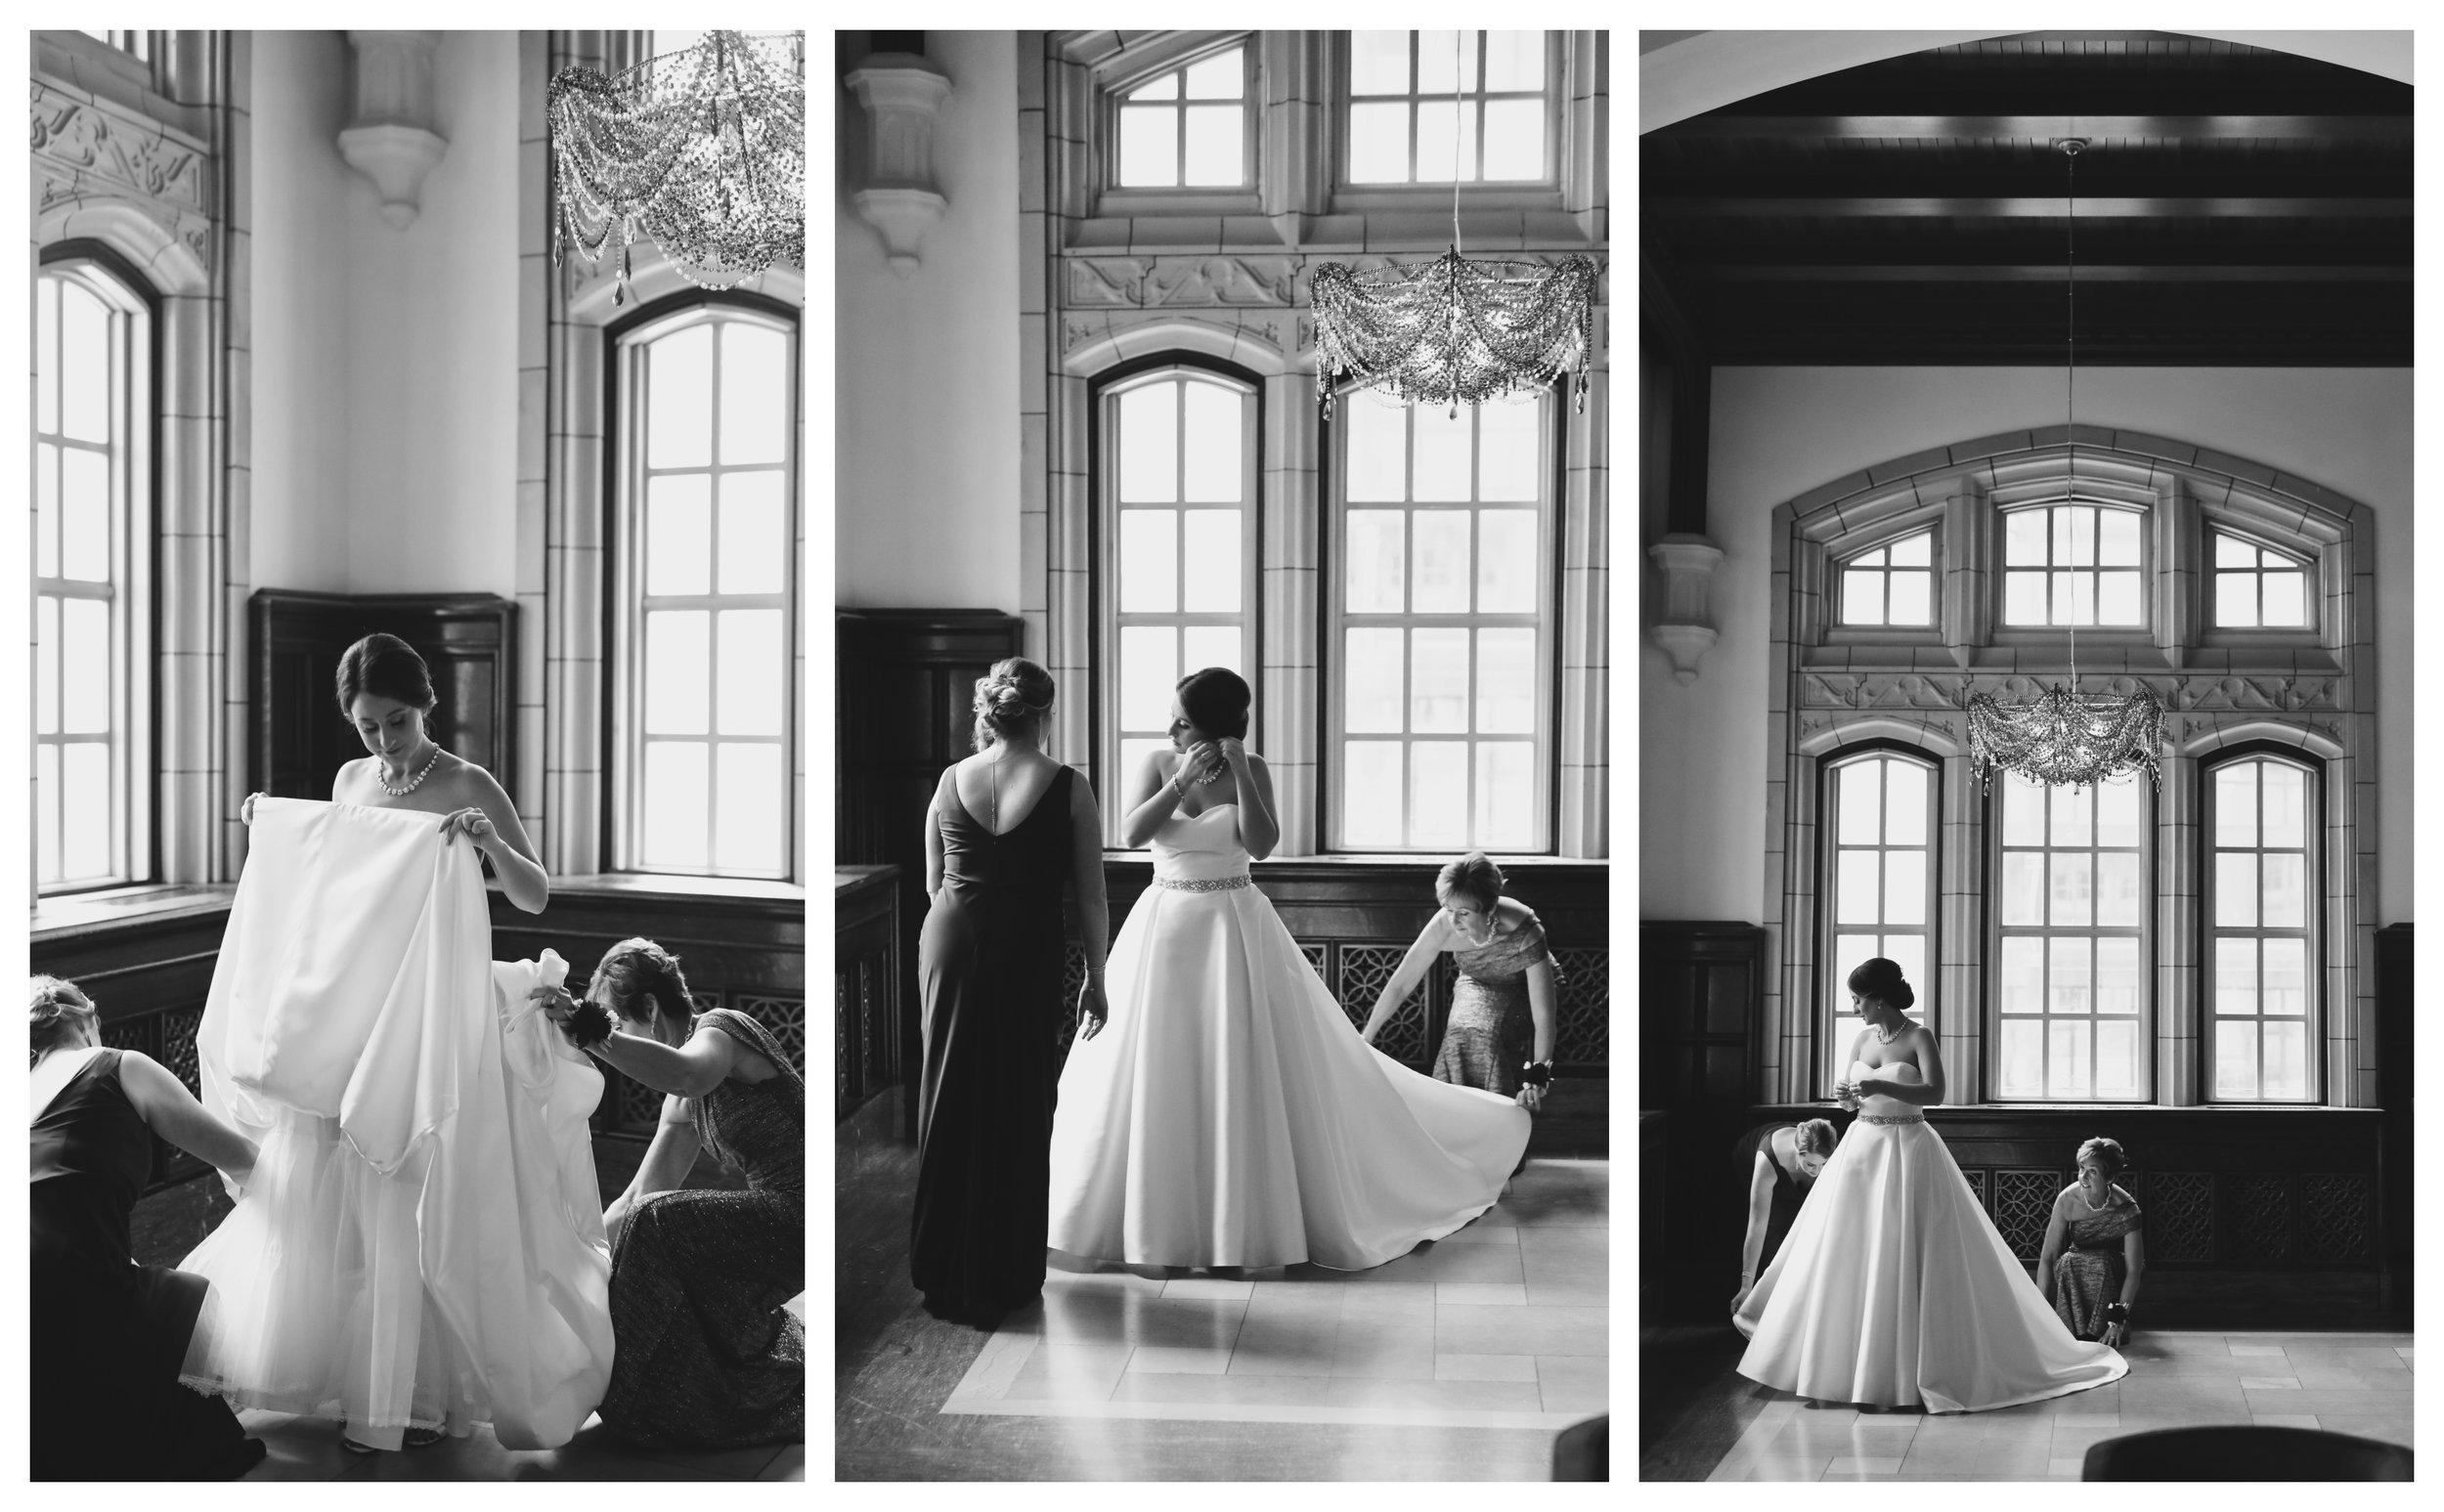 bridal shop_kansas city wedding6